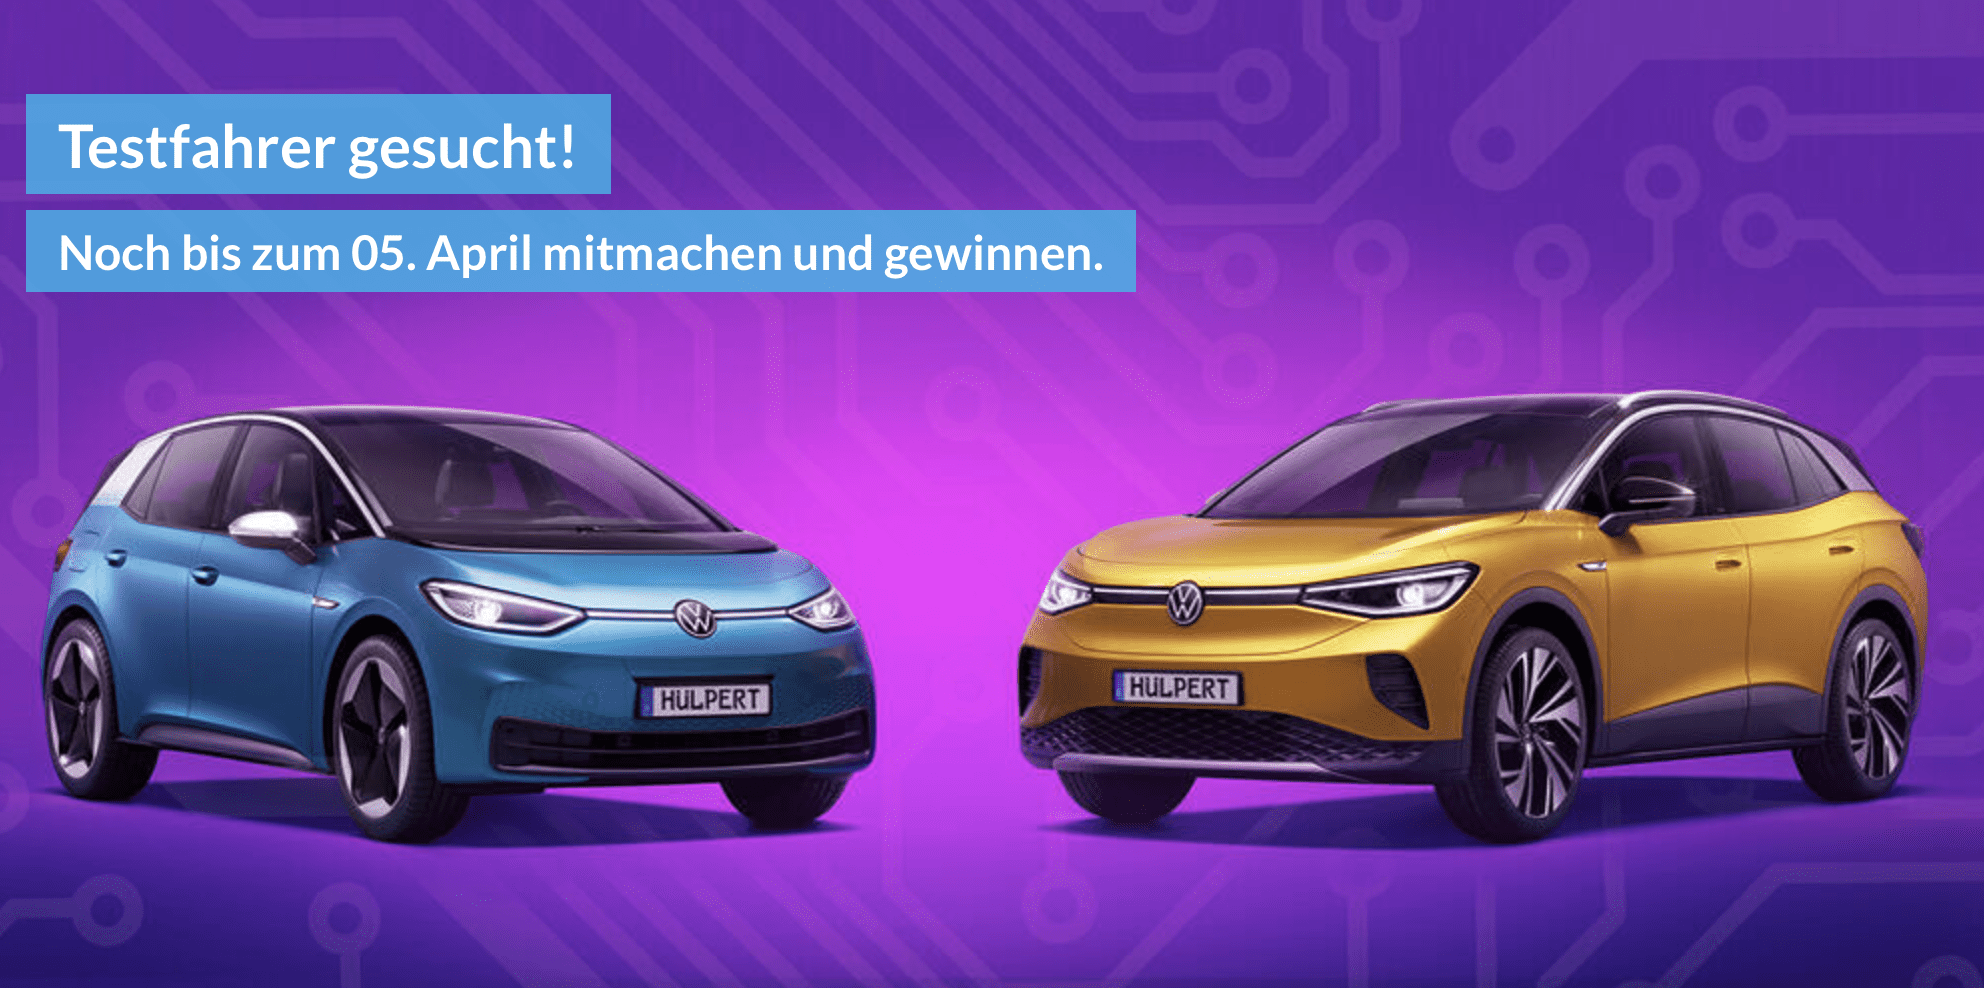 VW Holpert Gewinnspiel-Cases Automotive